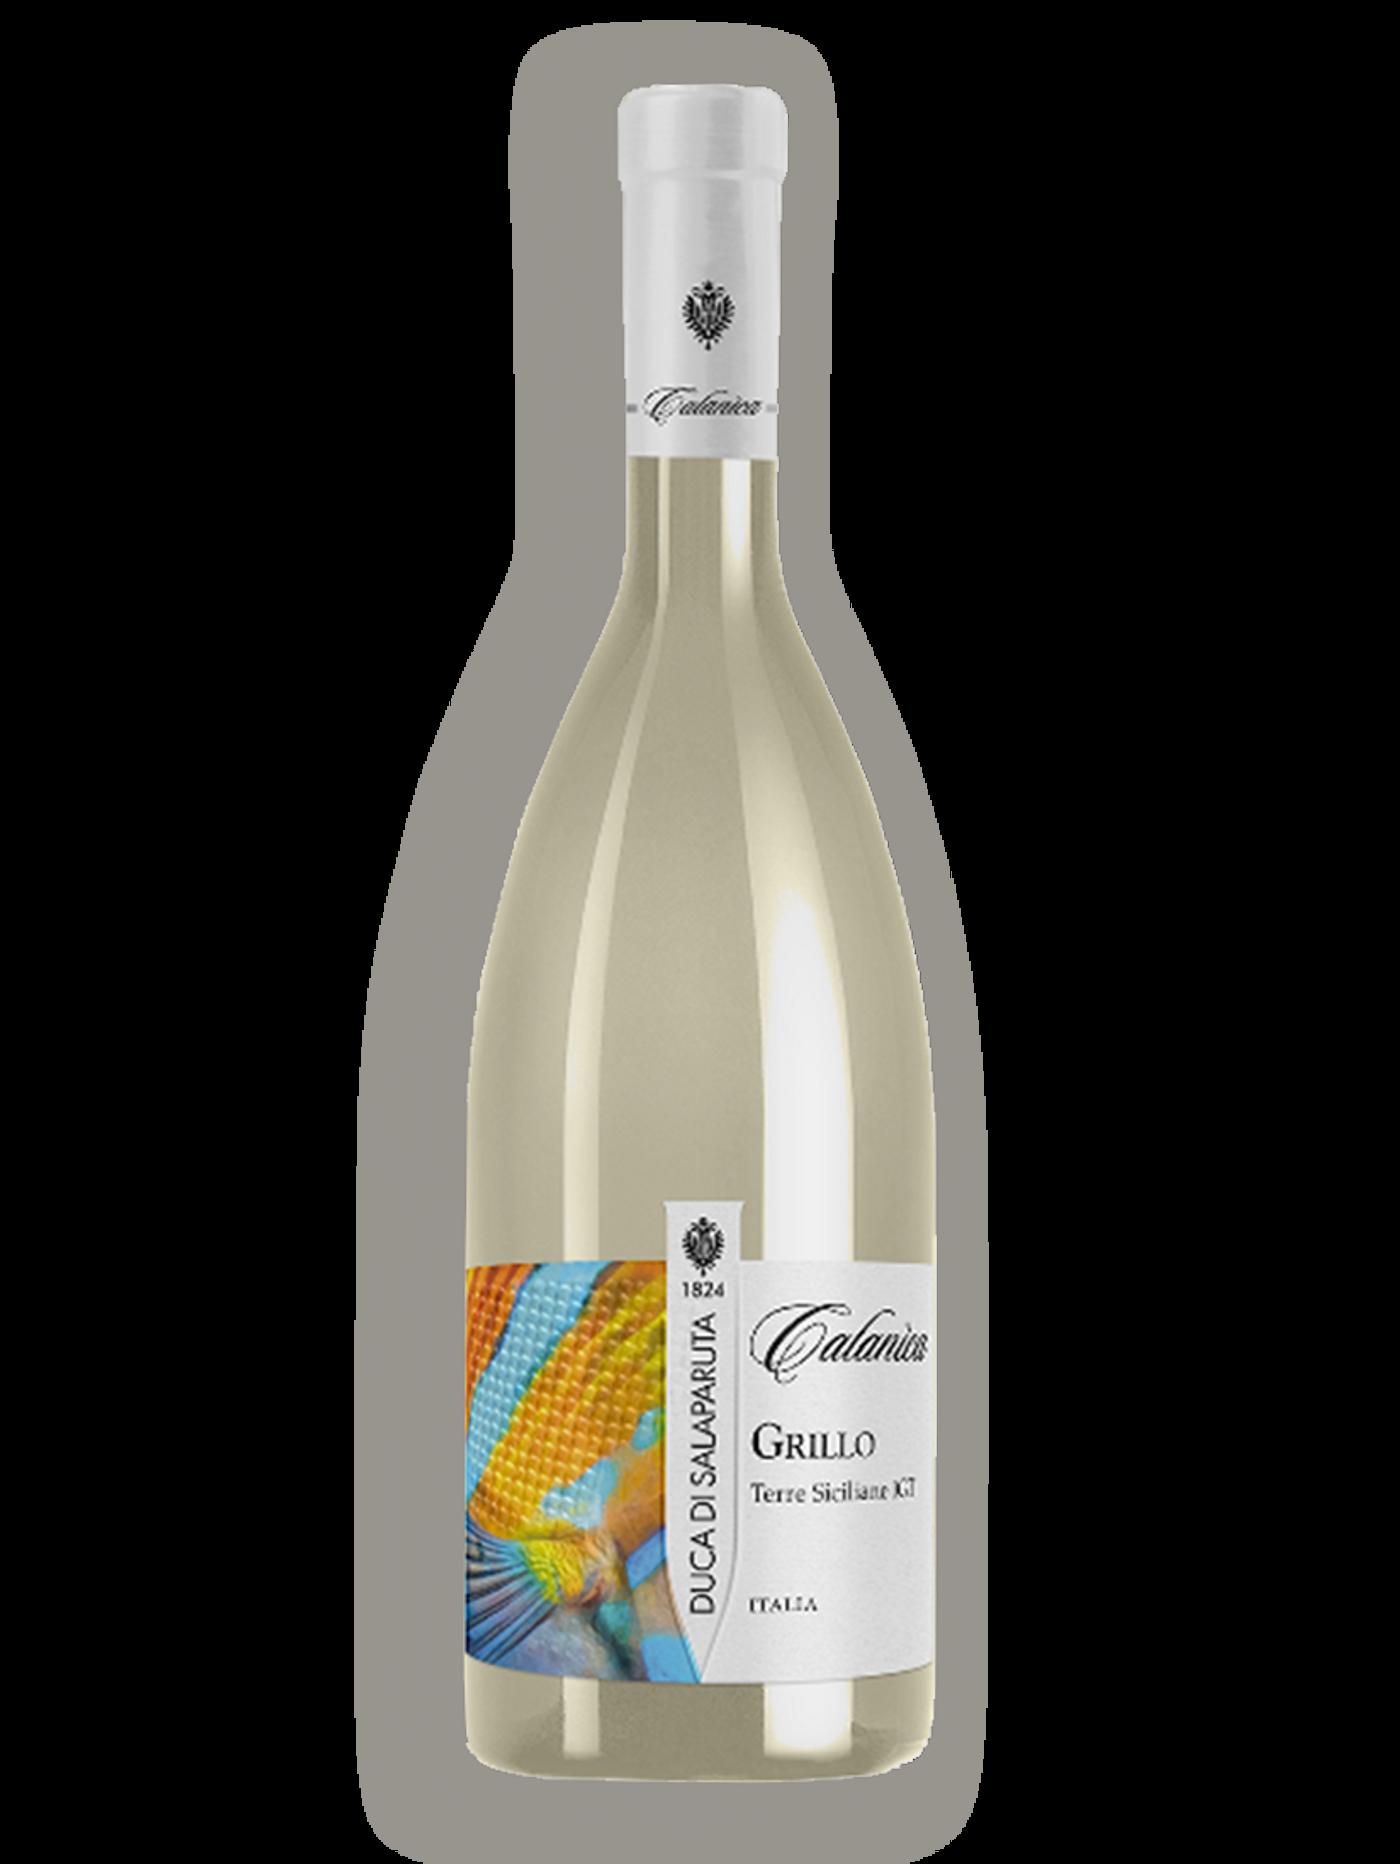 Calanica Bianco I.G.T. Terre Siciliane